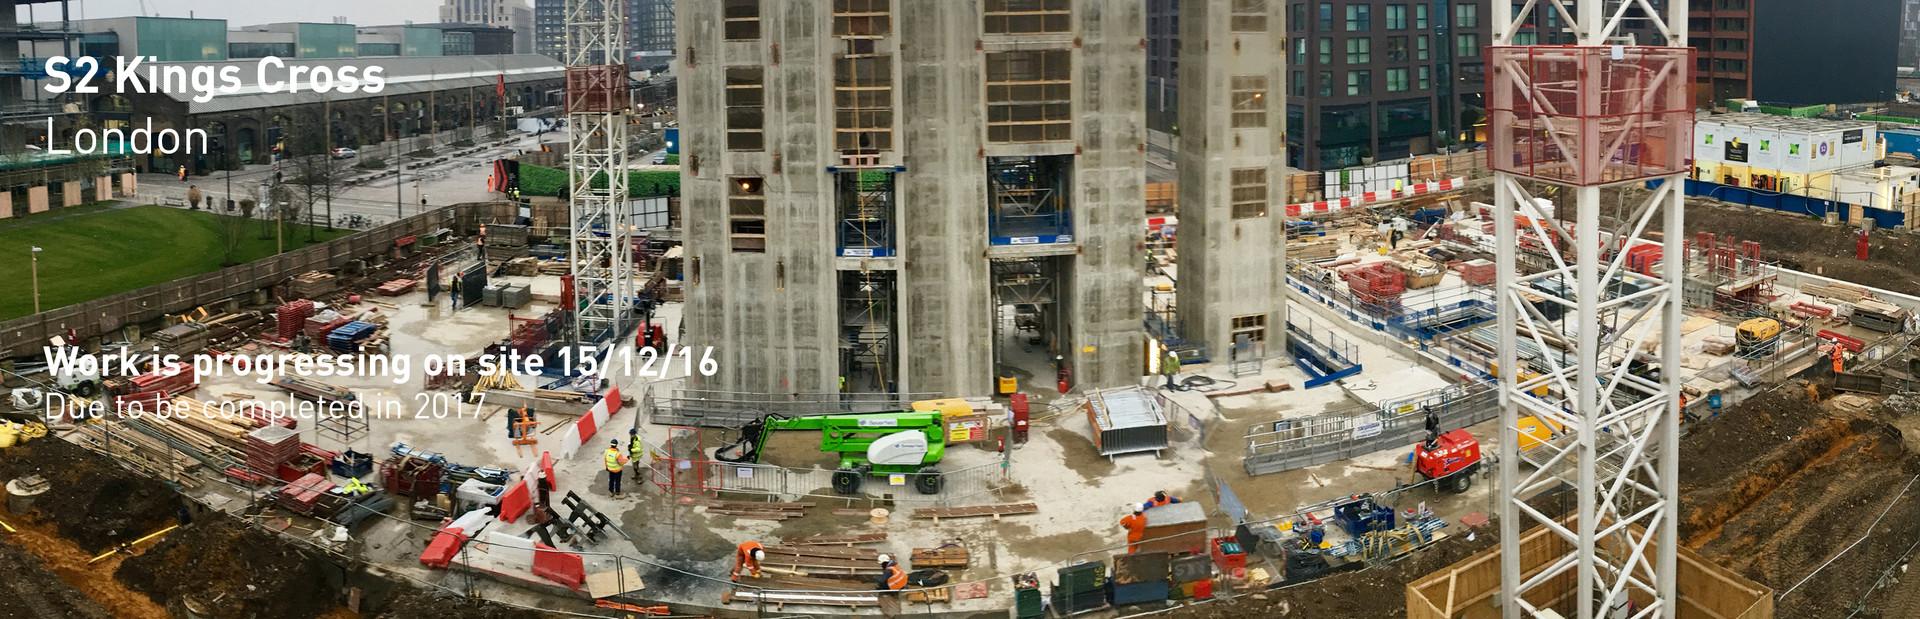 2016-12-15 – 14-101 – KXC – Construction